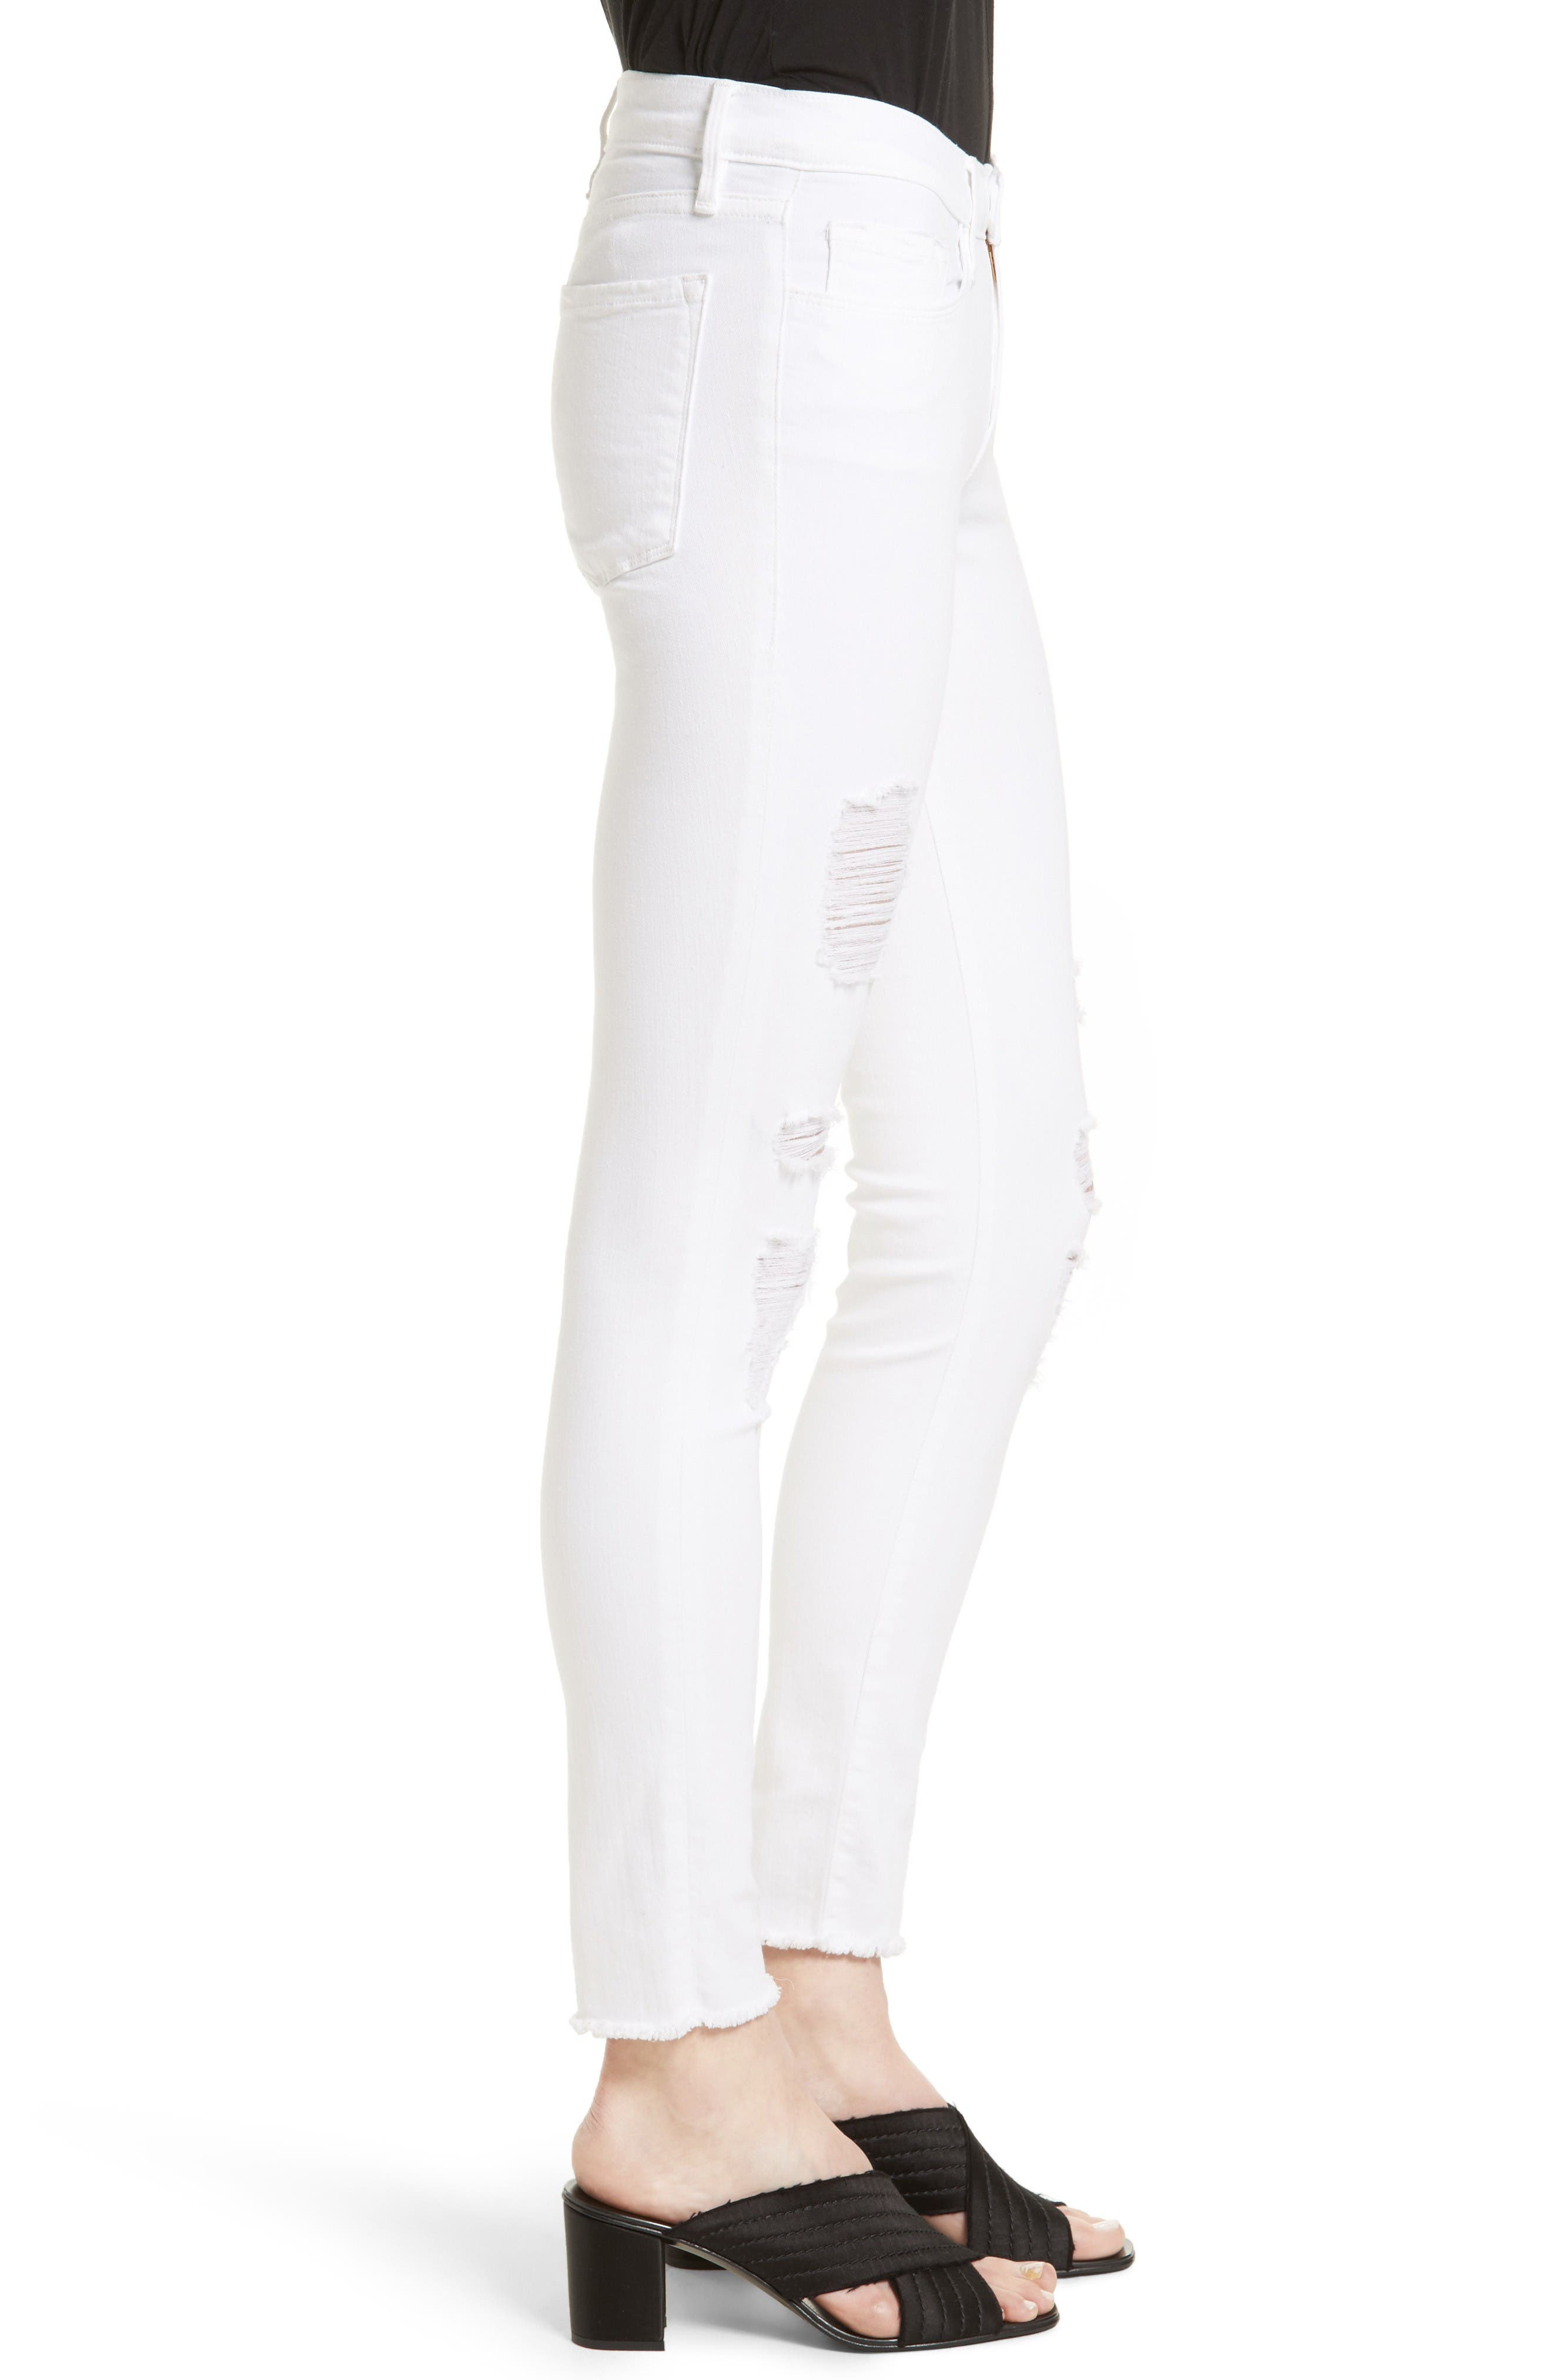 Alternate Image 3  - FRAME 'Le Skinny de Jeanne' Ripped Jeans (Noir Jefferson) (Nordstrom Exclusive)